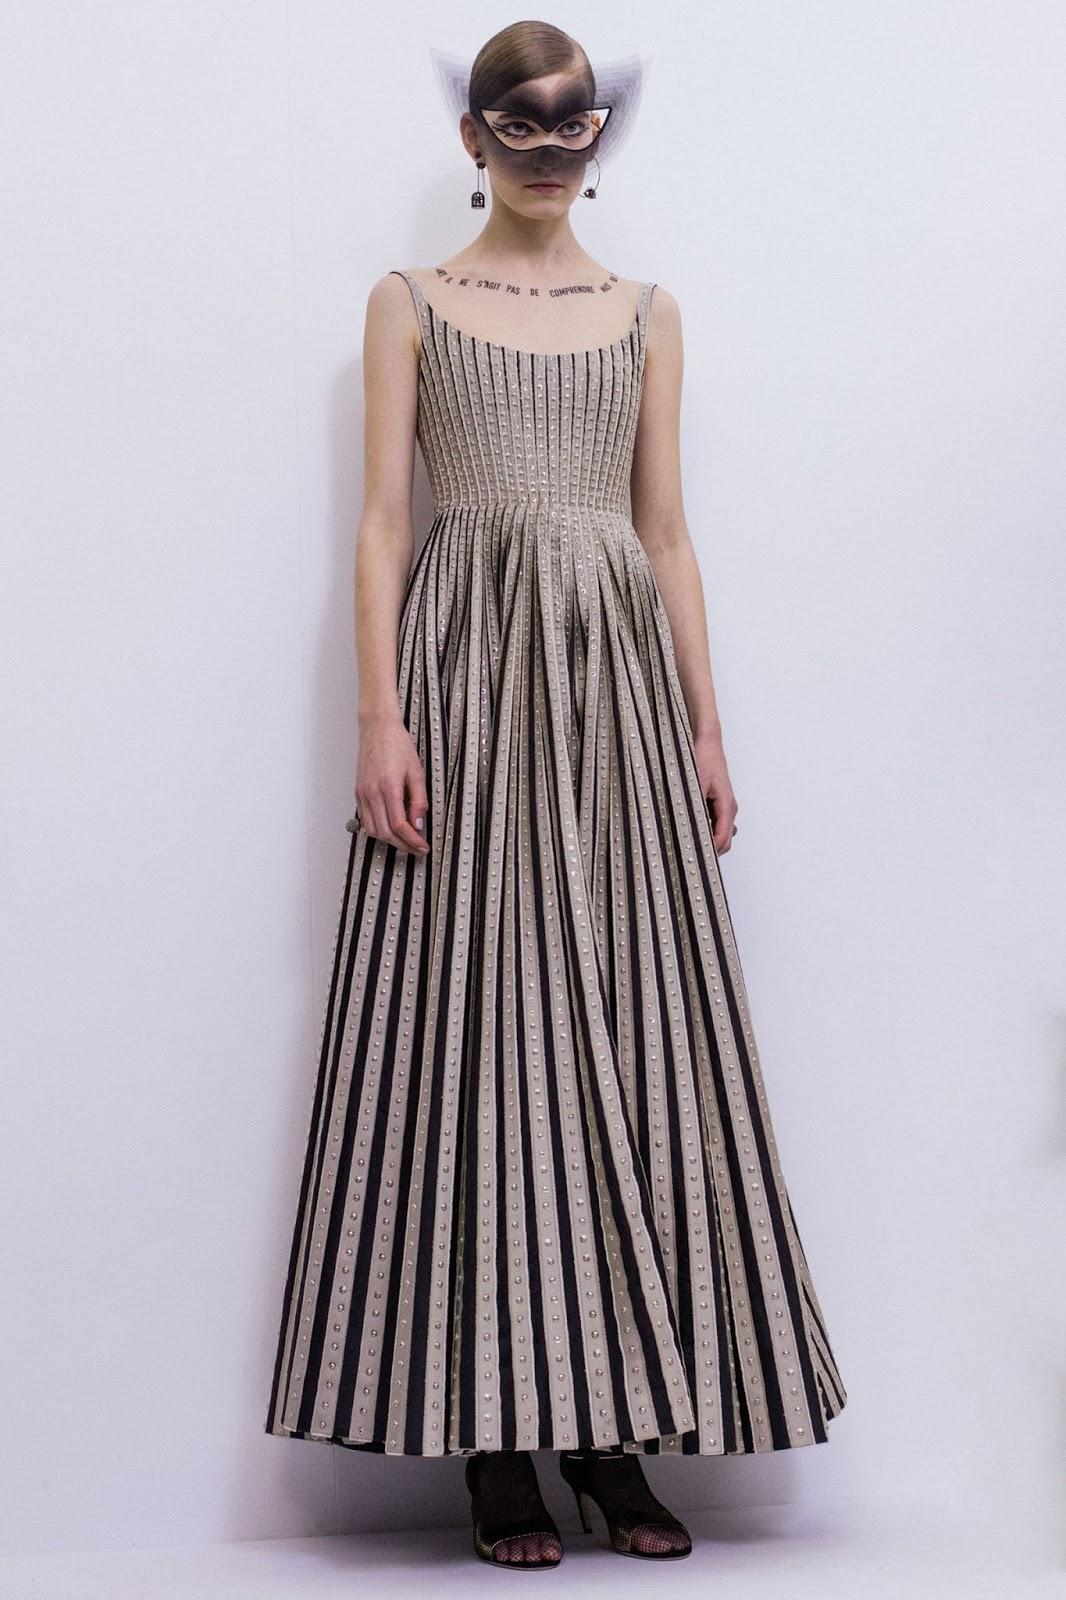 dior-couture-ss18, dior-haute-couture-ss18, dior-couture, Maria-Grazia-Chiuri-dior, paris-fashion-week-2018, pfw2018, pfw-2018, pfw-18, défilé-haute-couture, haute-couture, dudessinauxpodiums